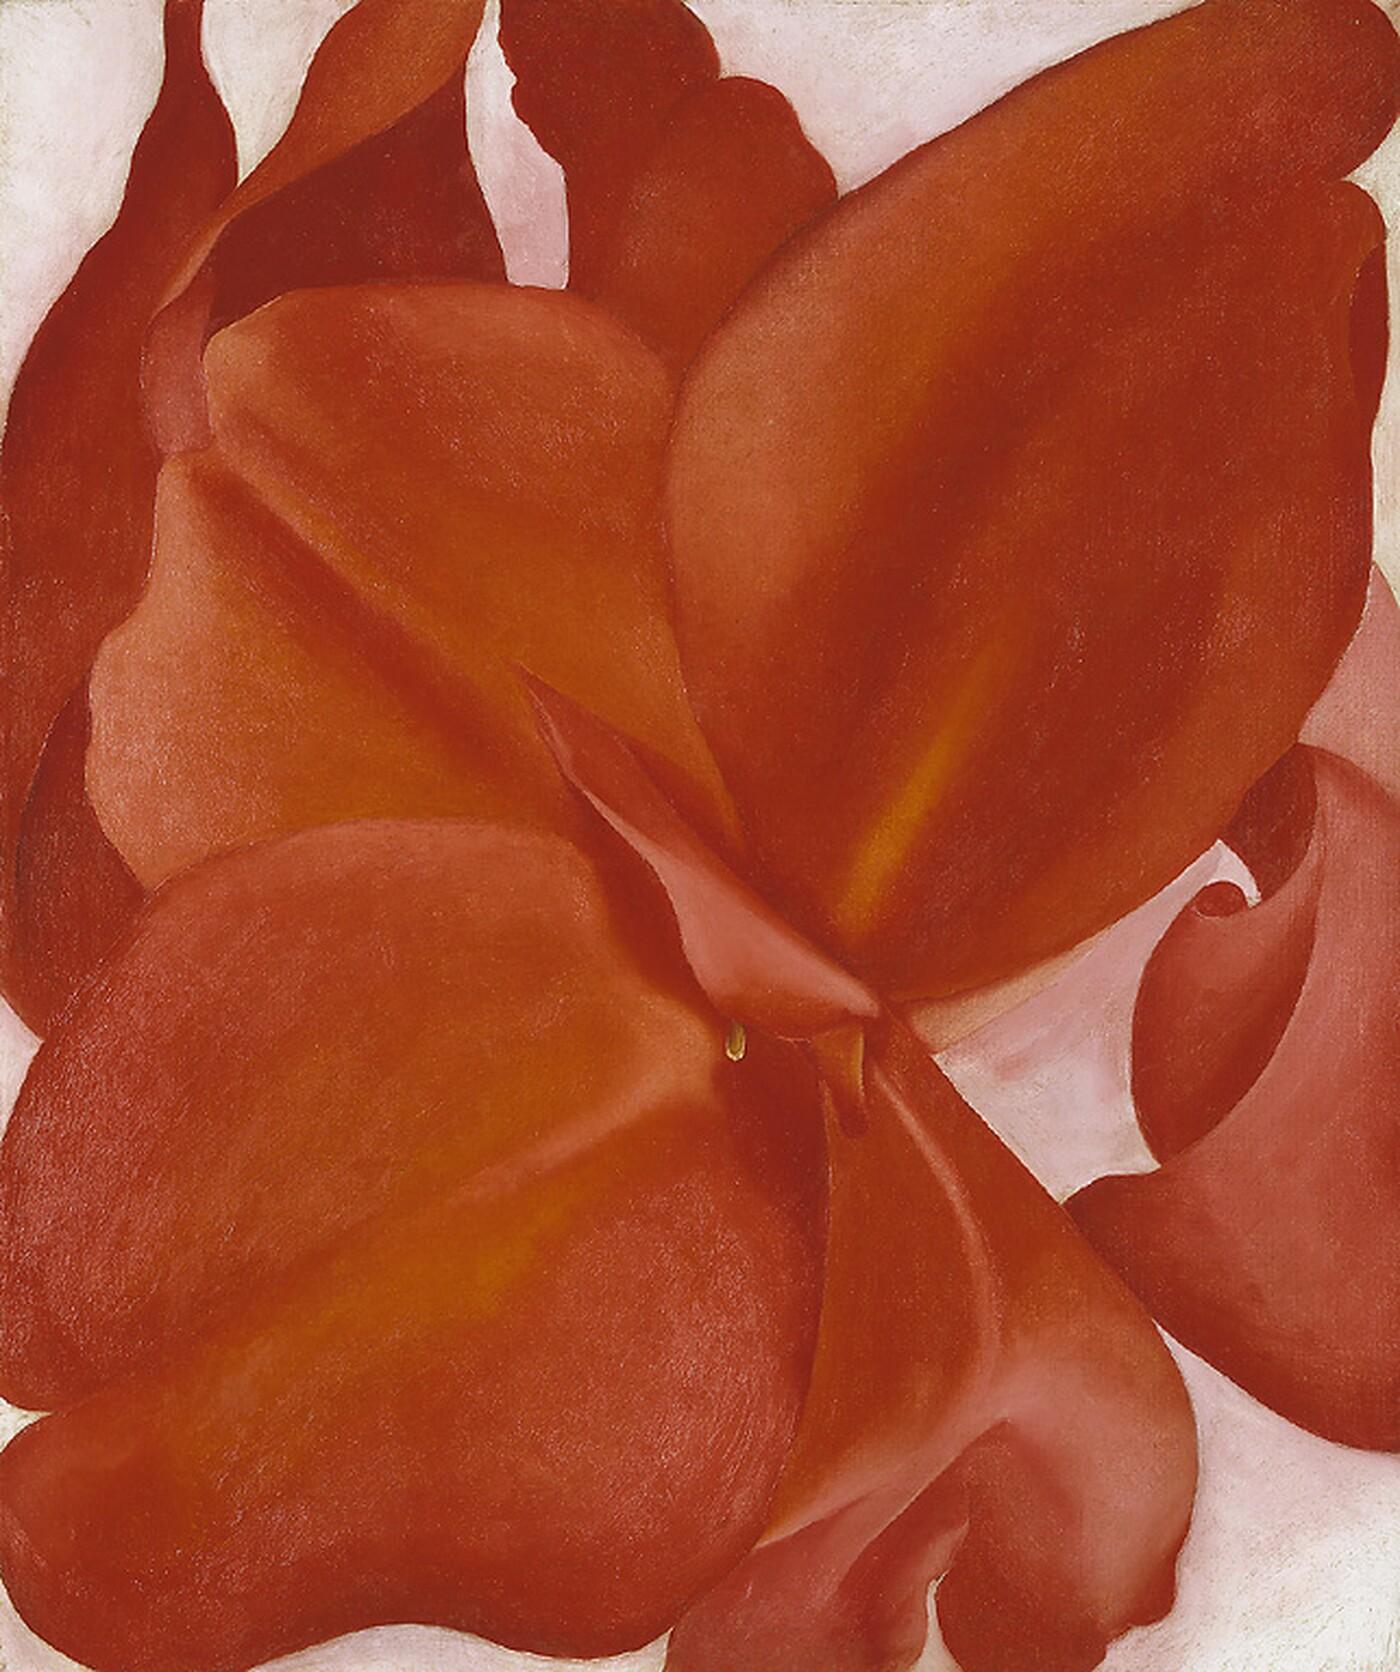 Red Cannas by Georgia O'Keeffe, 1927